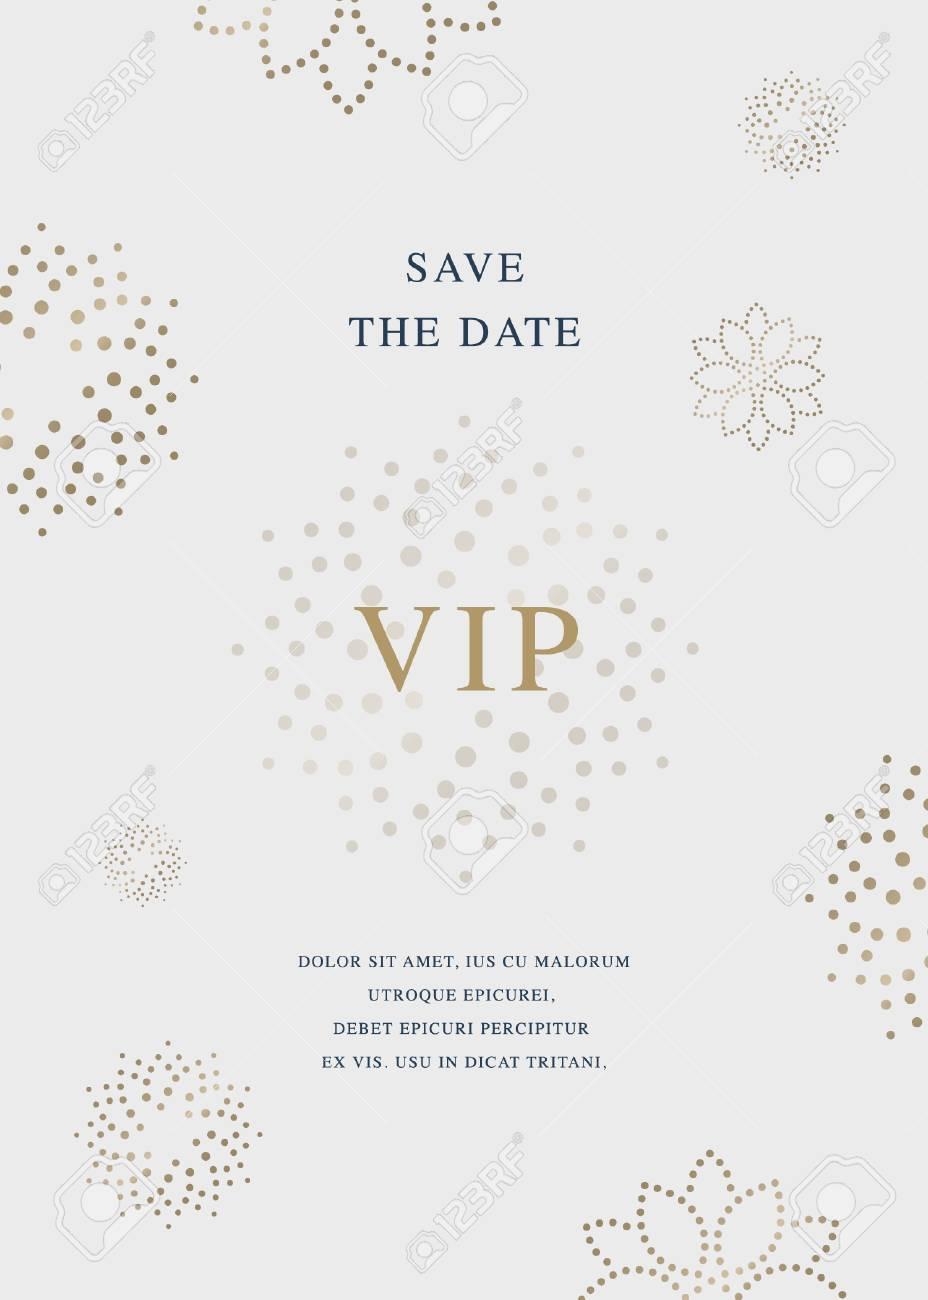 Luxury golden beauty vector invitation card template royalty free luxury golden beauty vector invitation card template stock vector 88305236 stopboris Choice Image